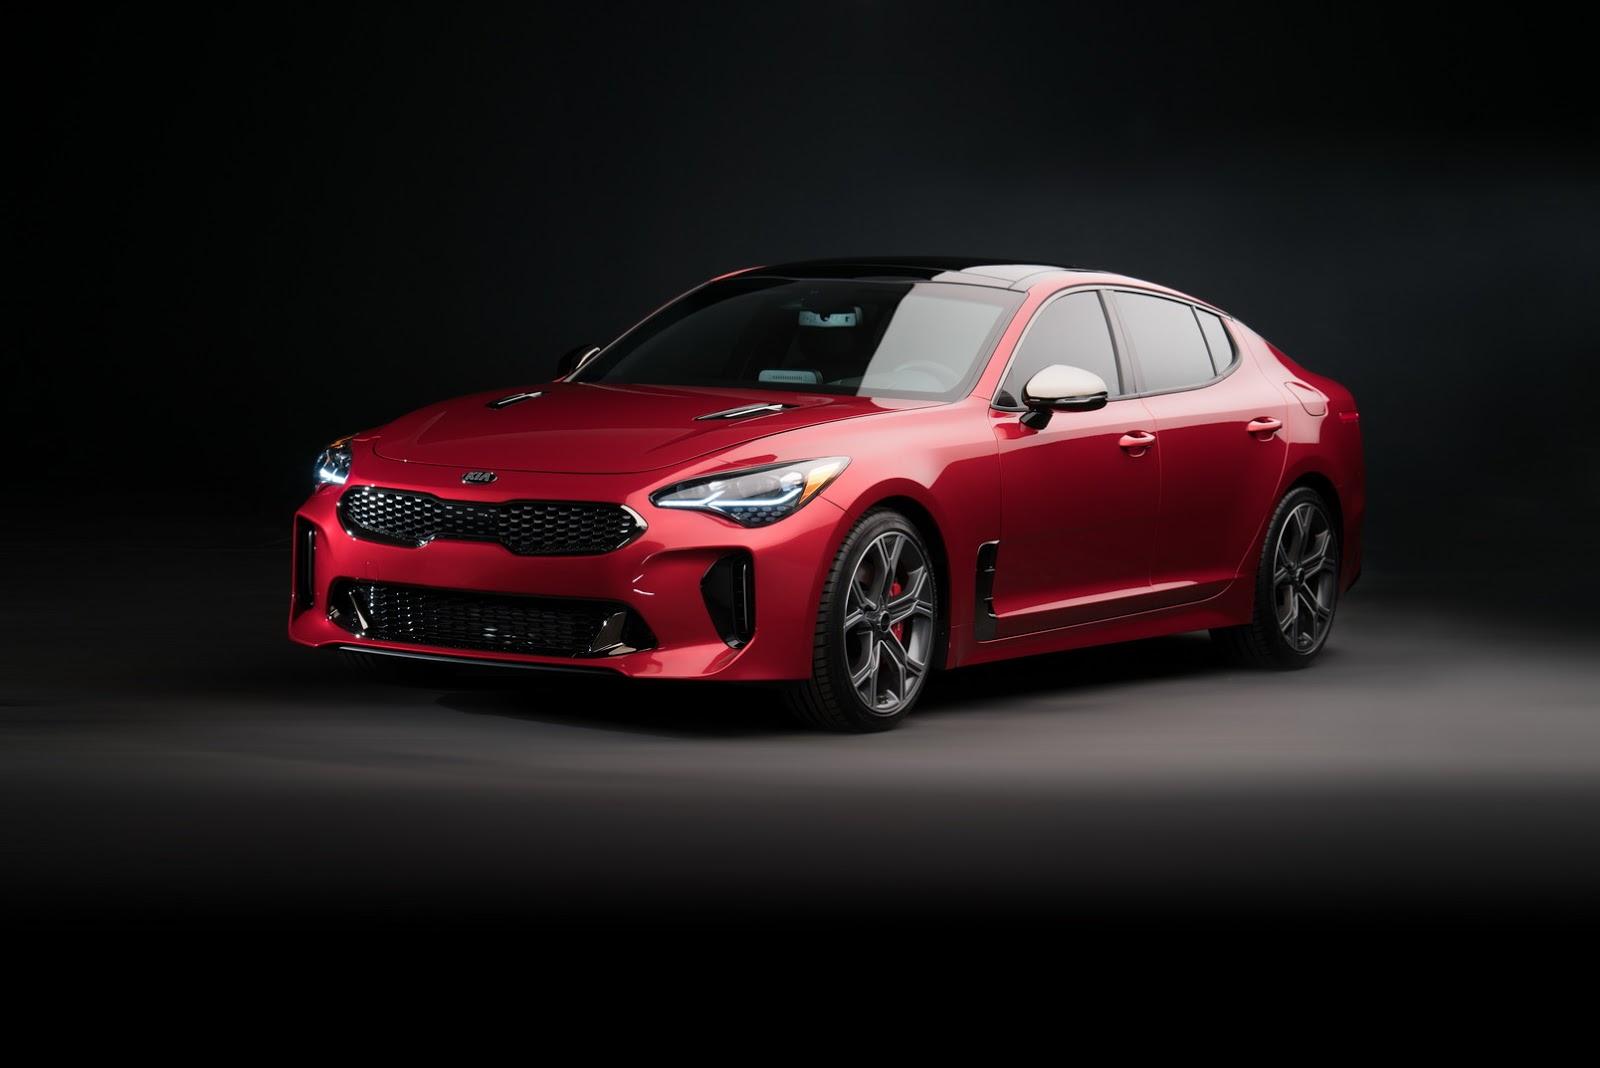 2018 Kia Stinger GT (9)